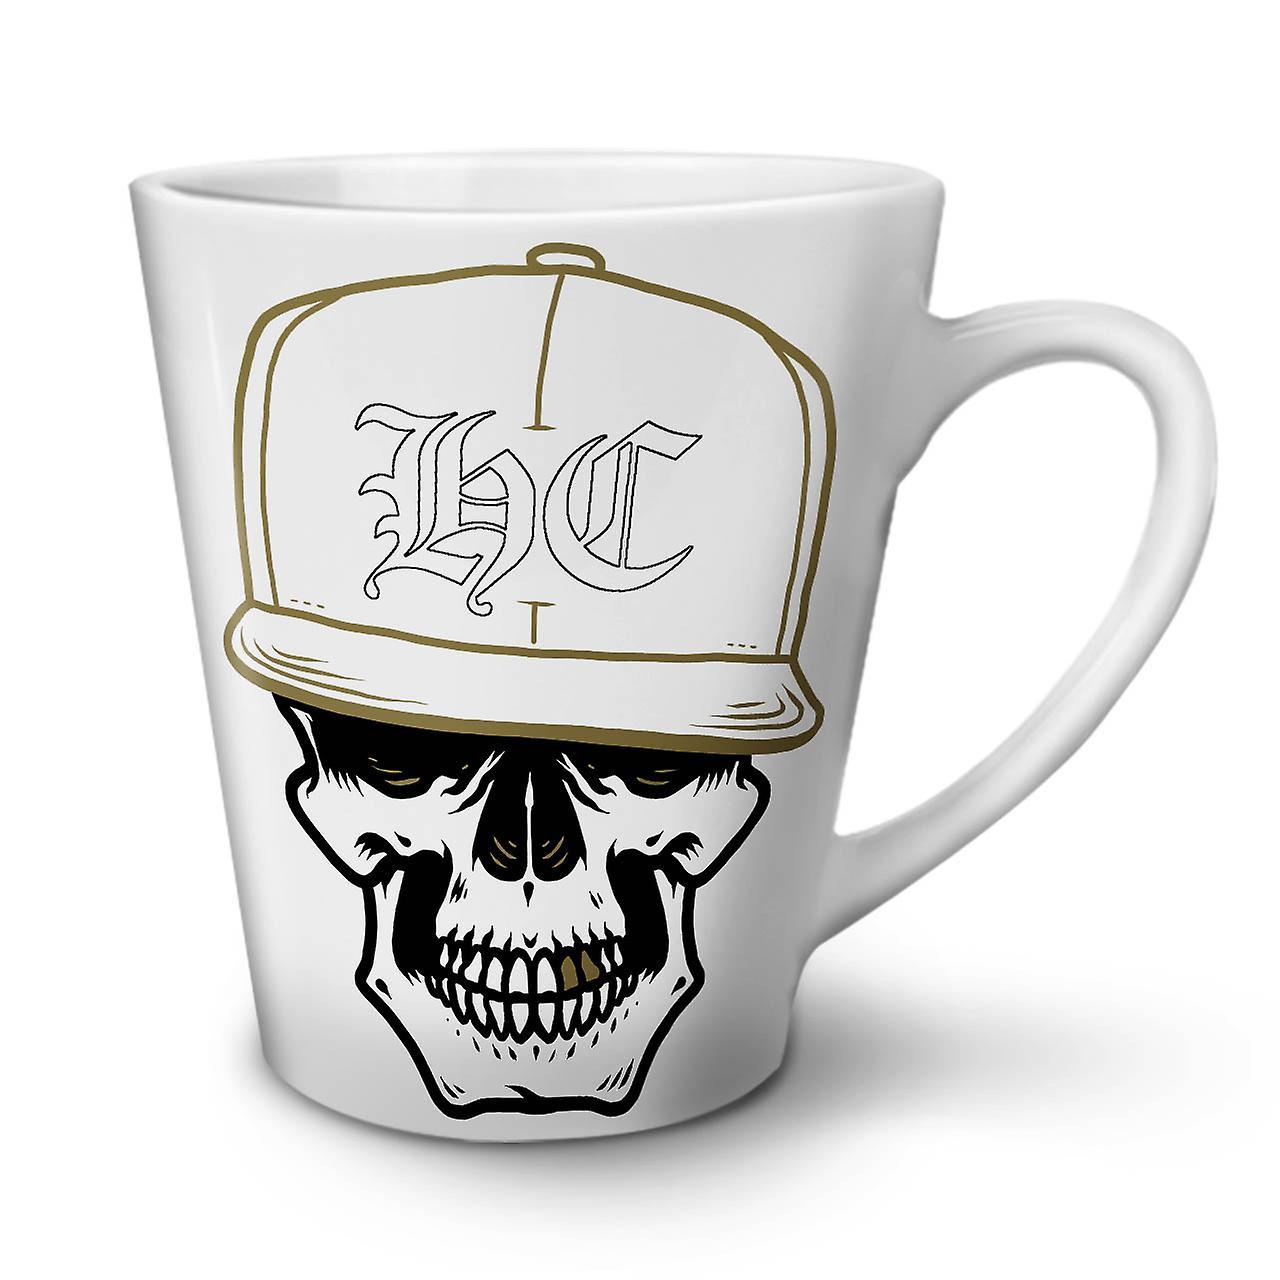 Ceramic Tea Swag Latte Gamer 12 New Mug White OzWellcoda Skull Coffee D2EIWH9